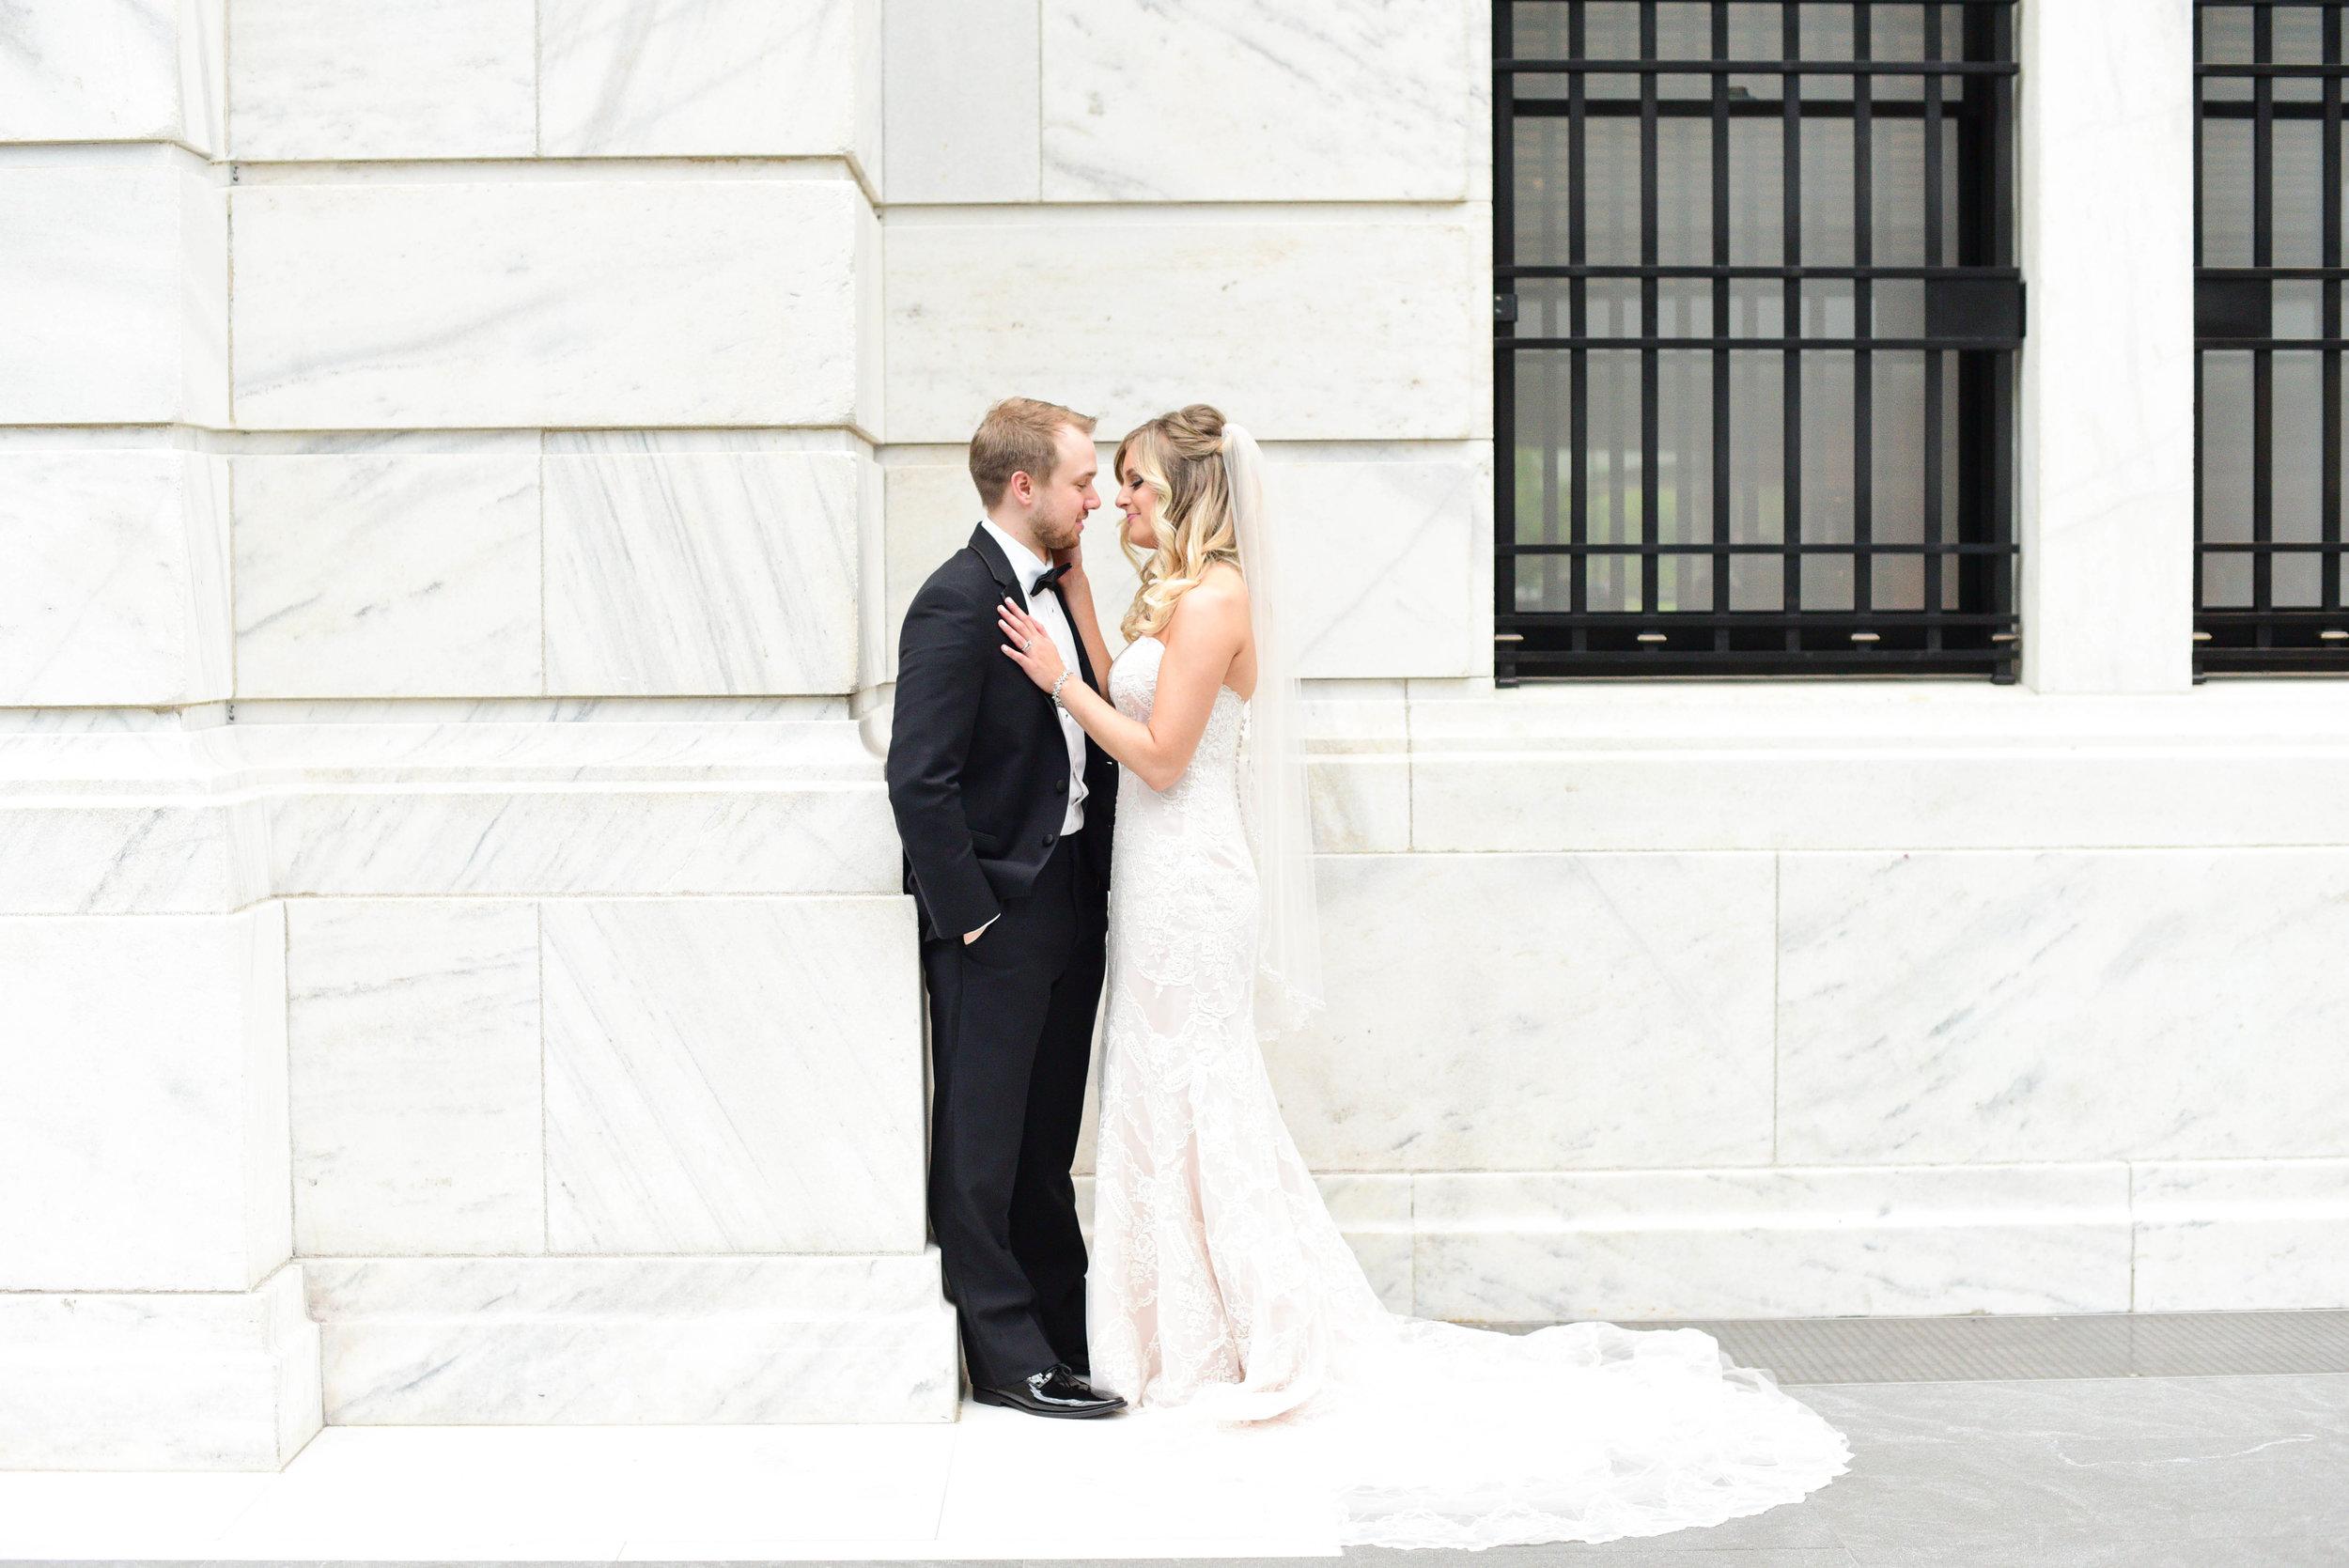 Dustin Rachel Cleveland Wedding 22.jpg